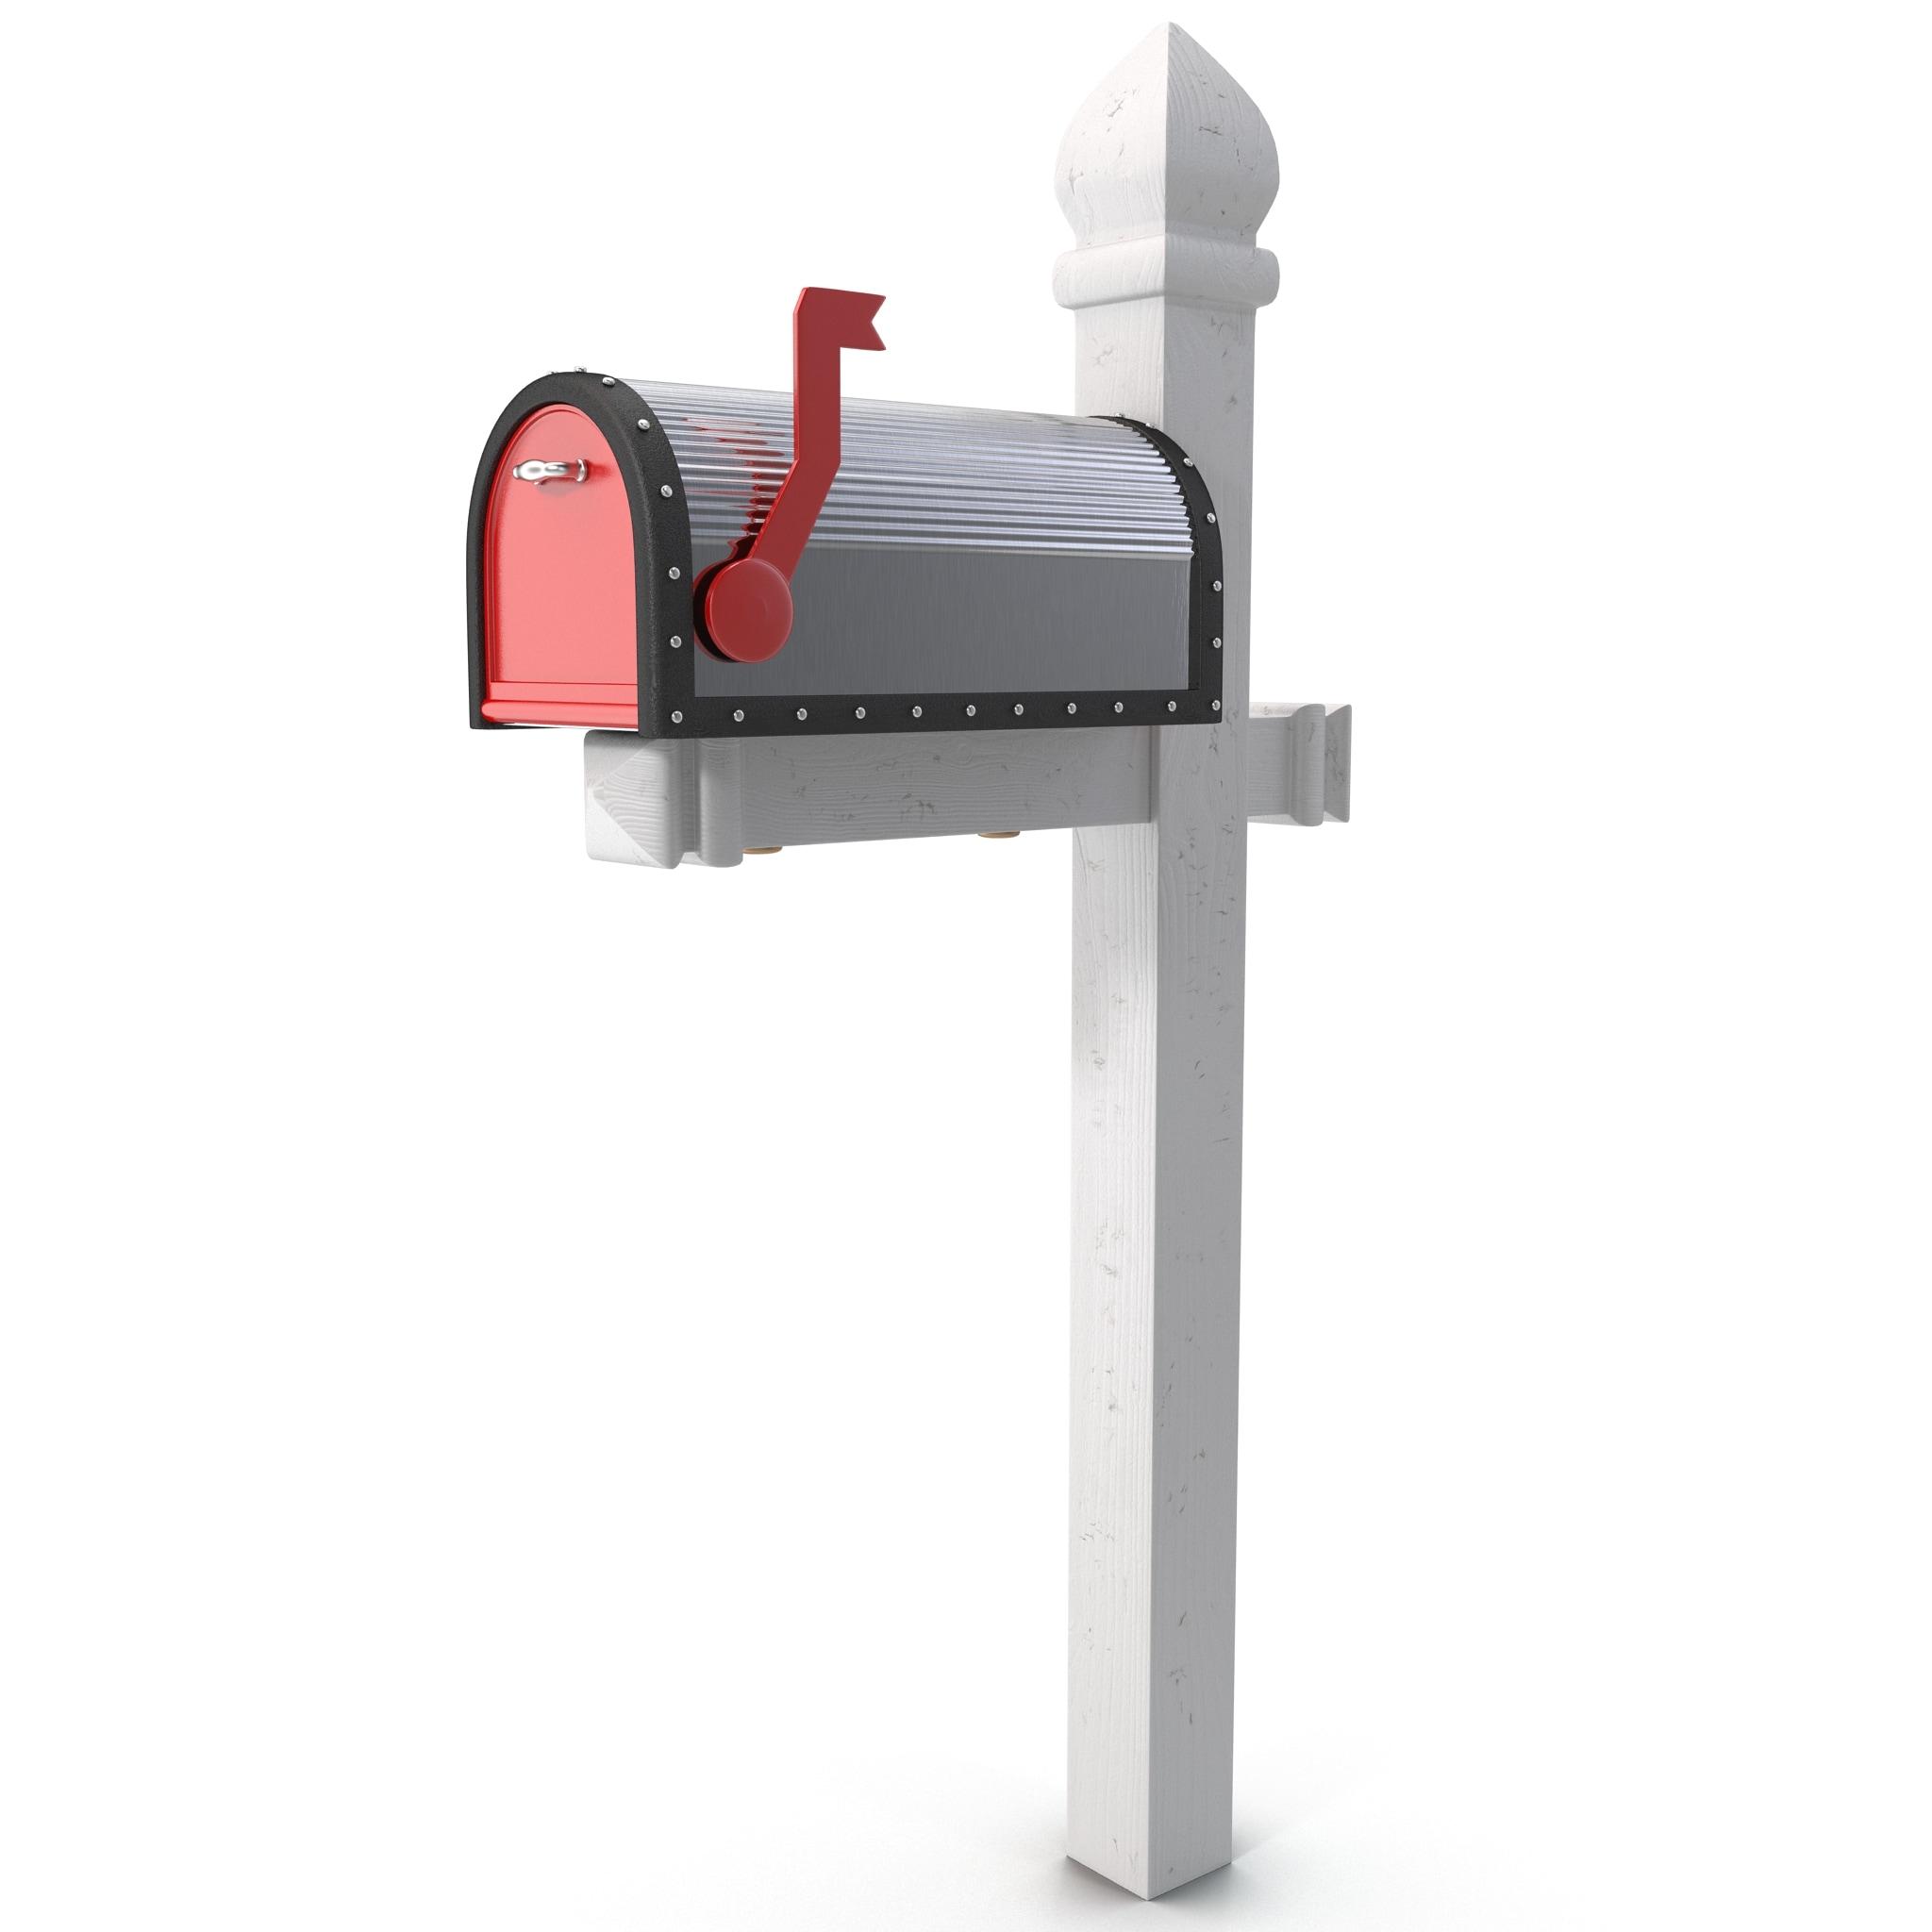 mailbox 3D Models | TurboSquid.com